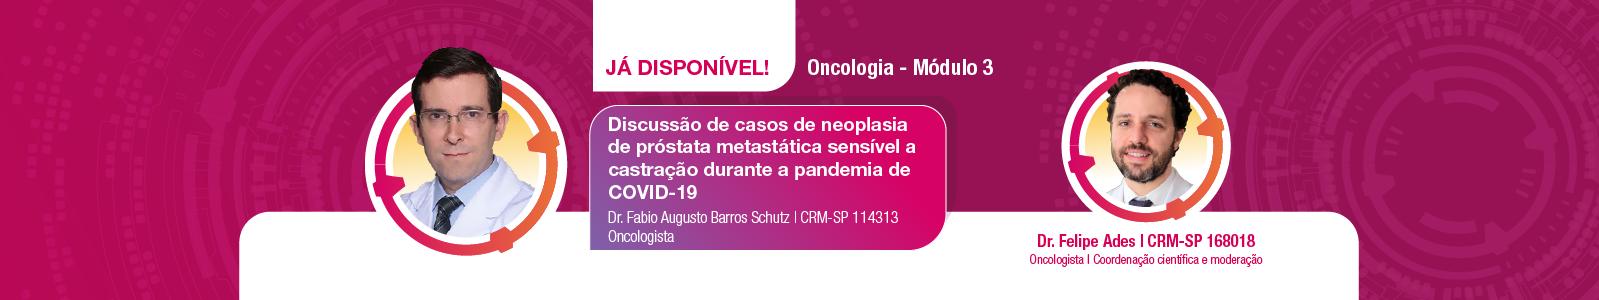 Módulo 3 Oncologia disponível